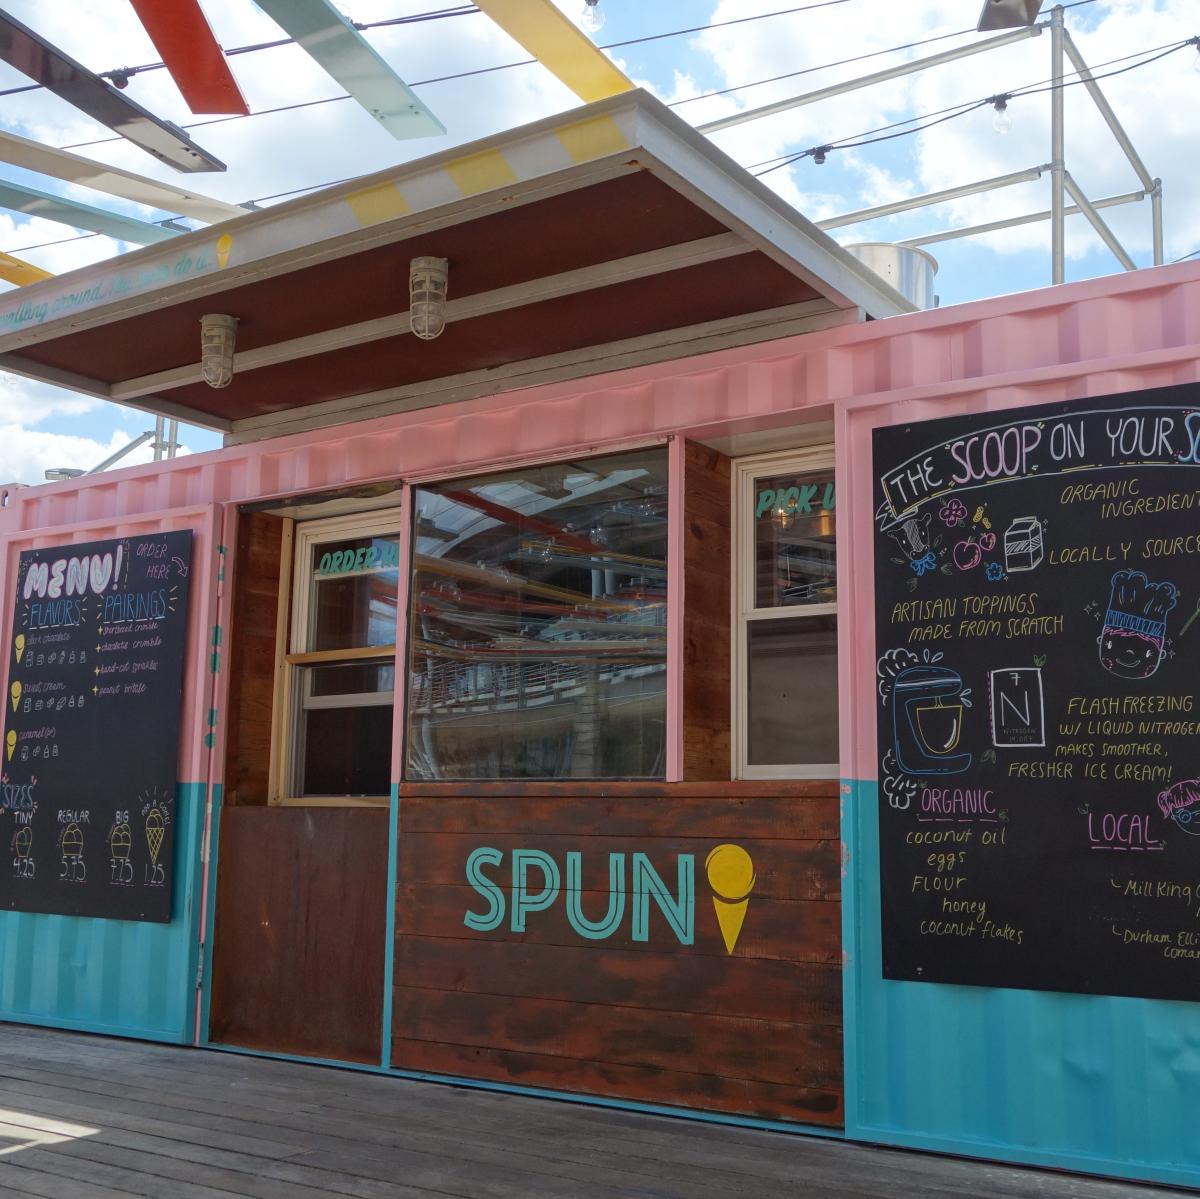 Spun Ice Cream Domain